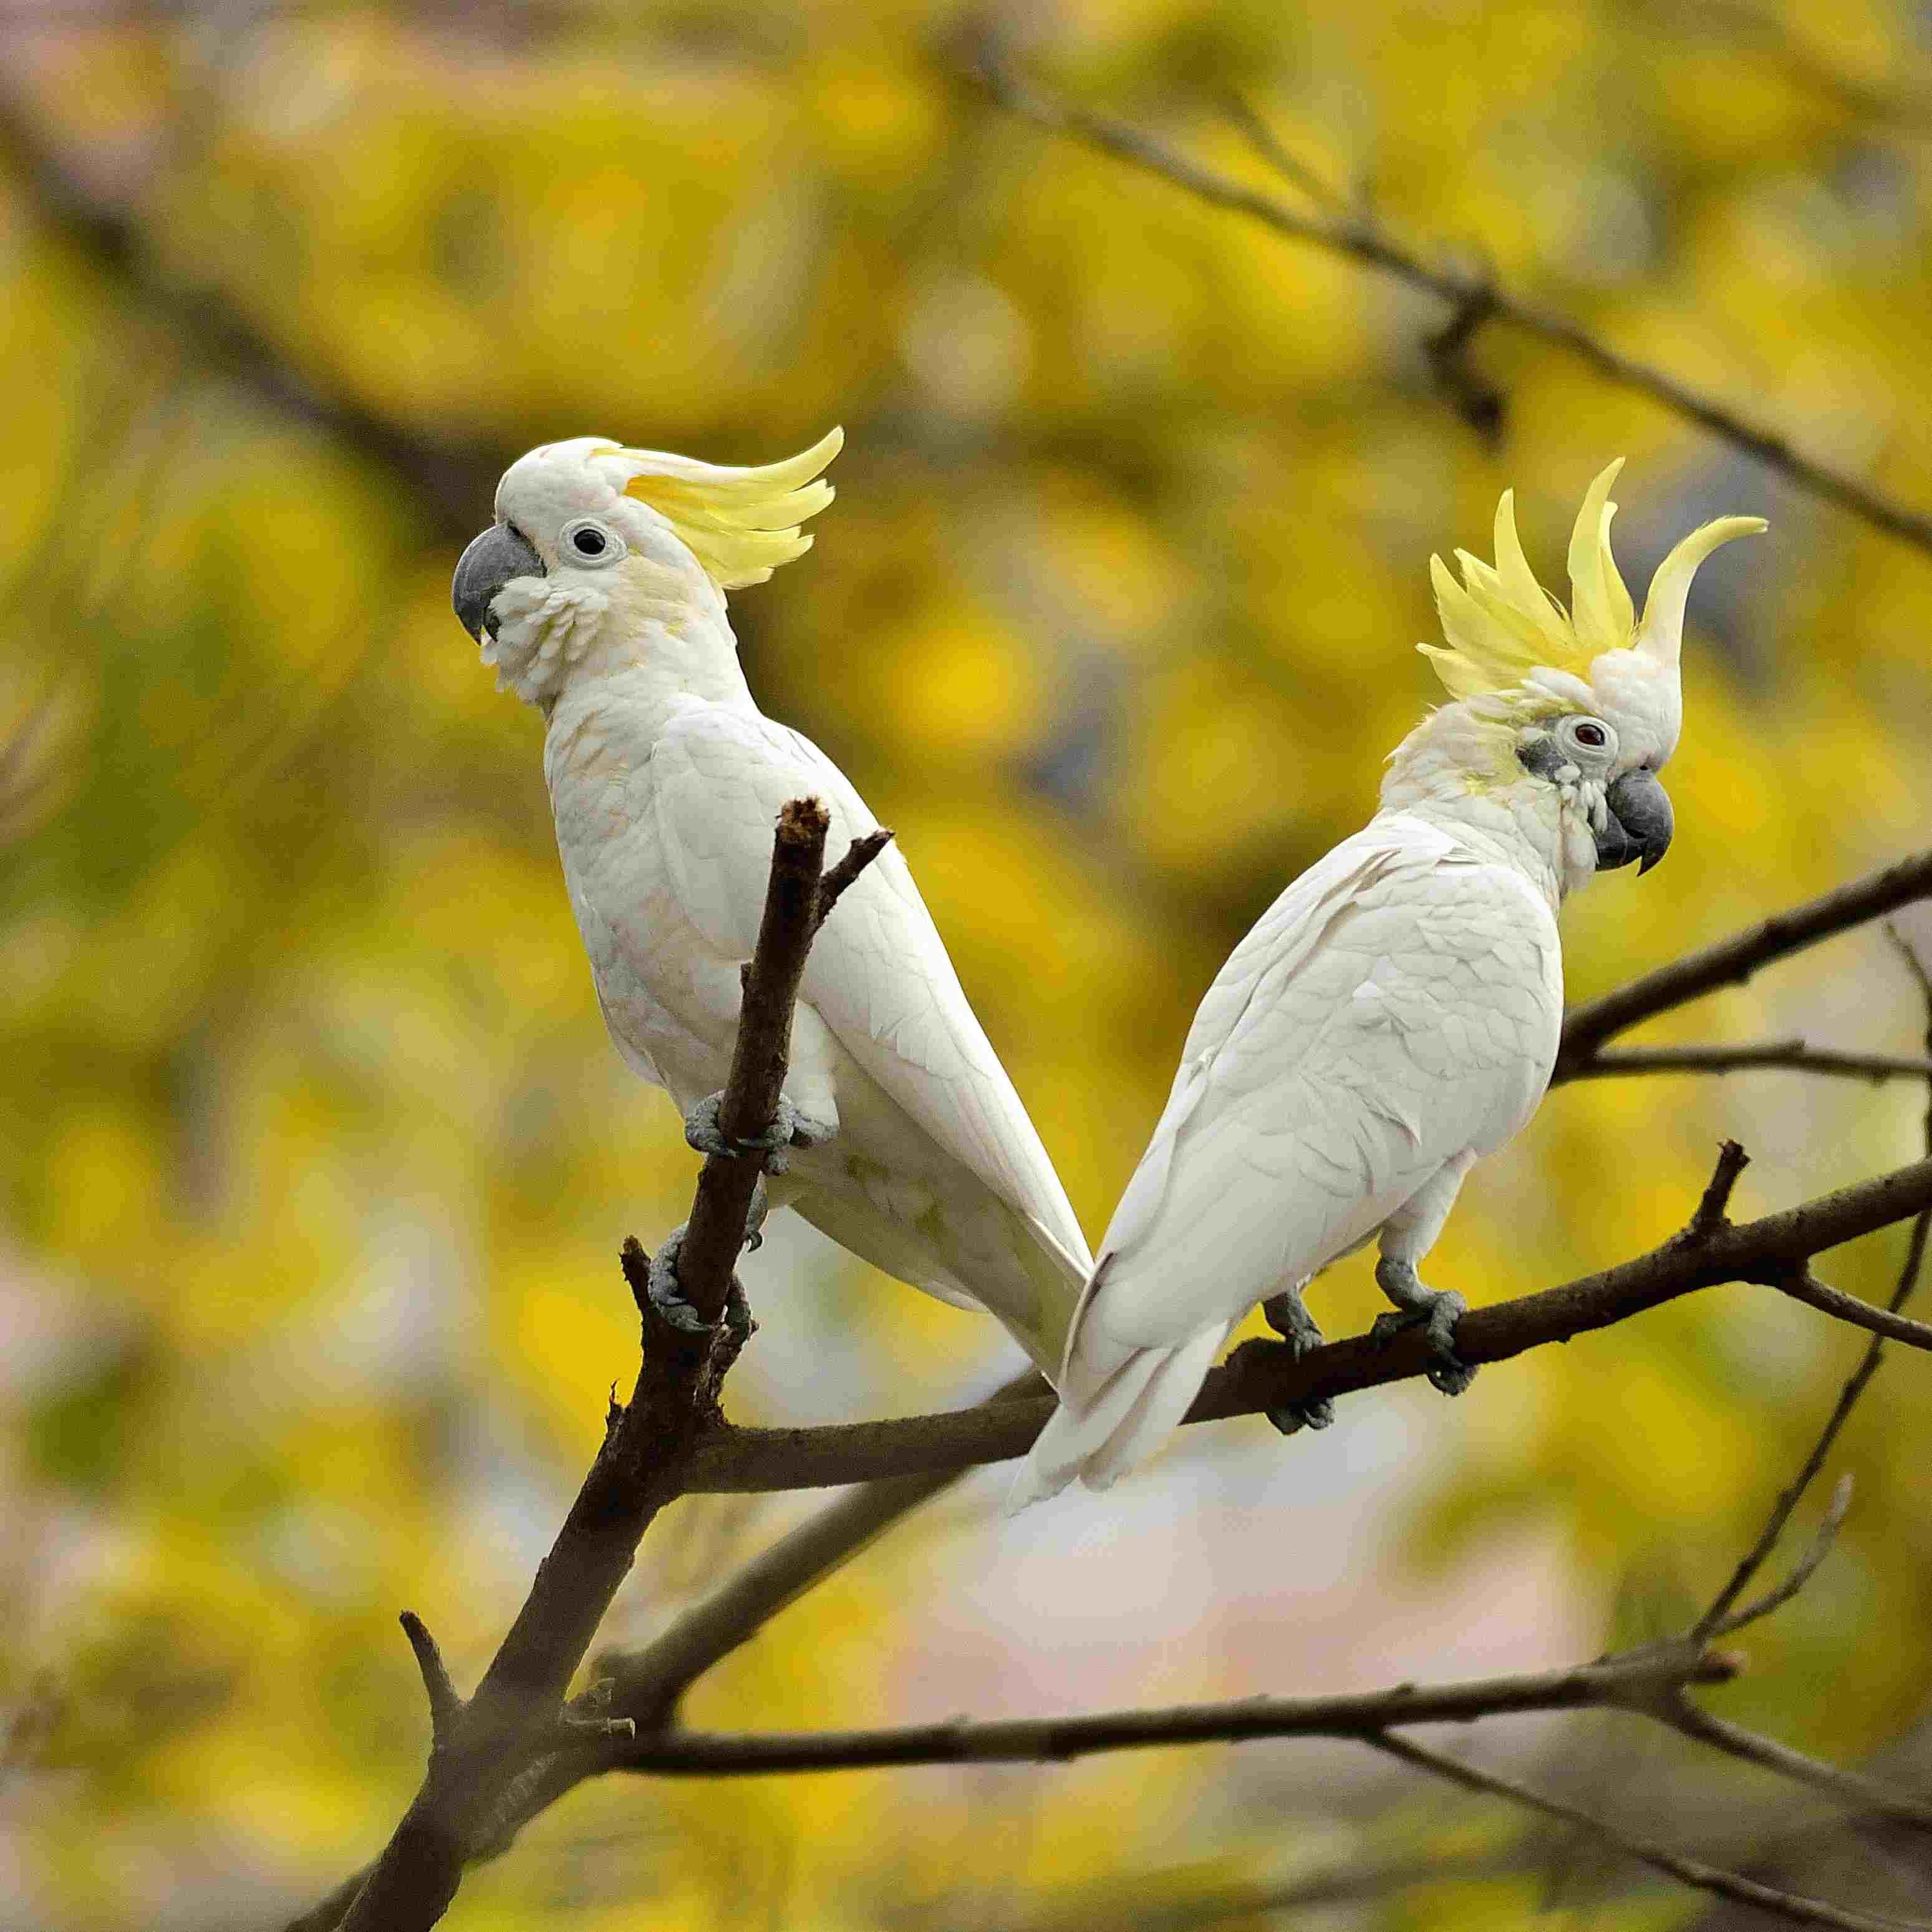 Cockatoo pair with crest raised